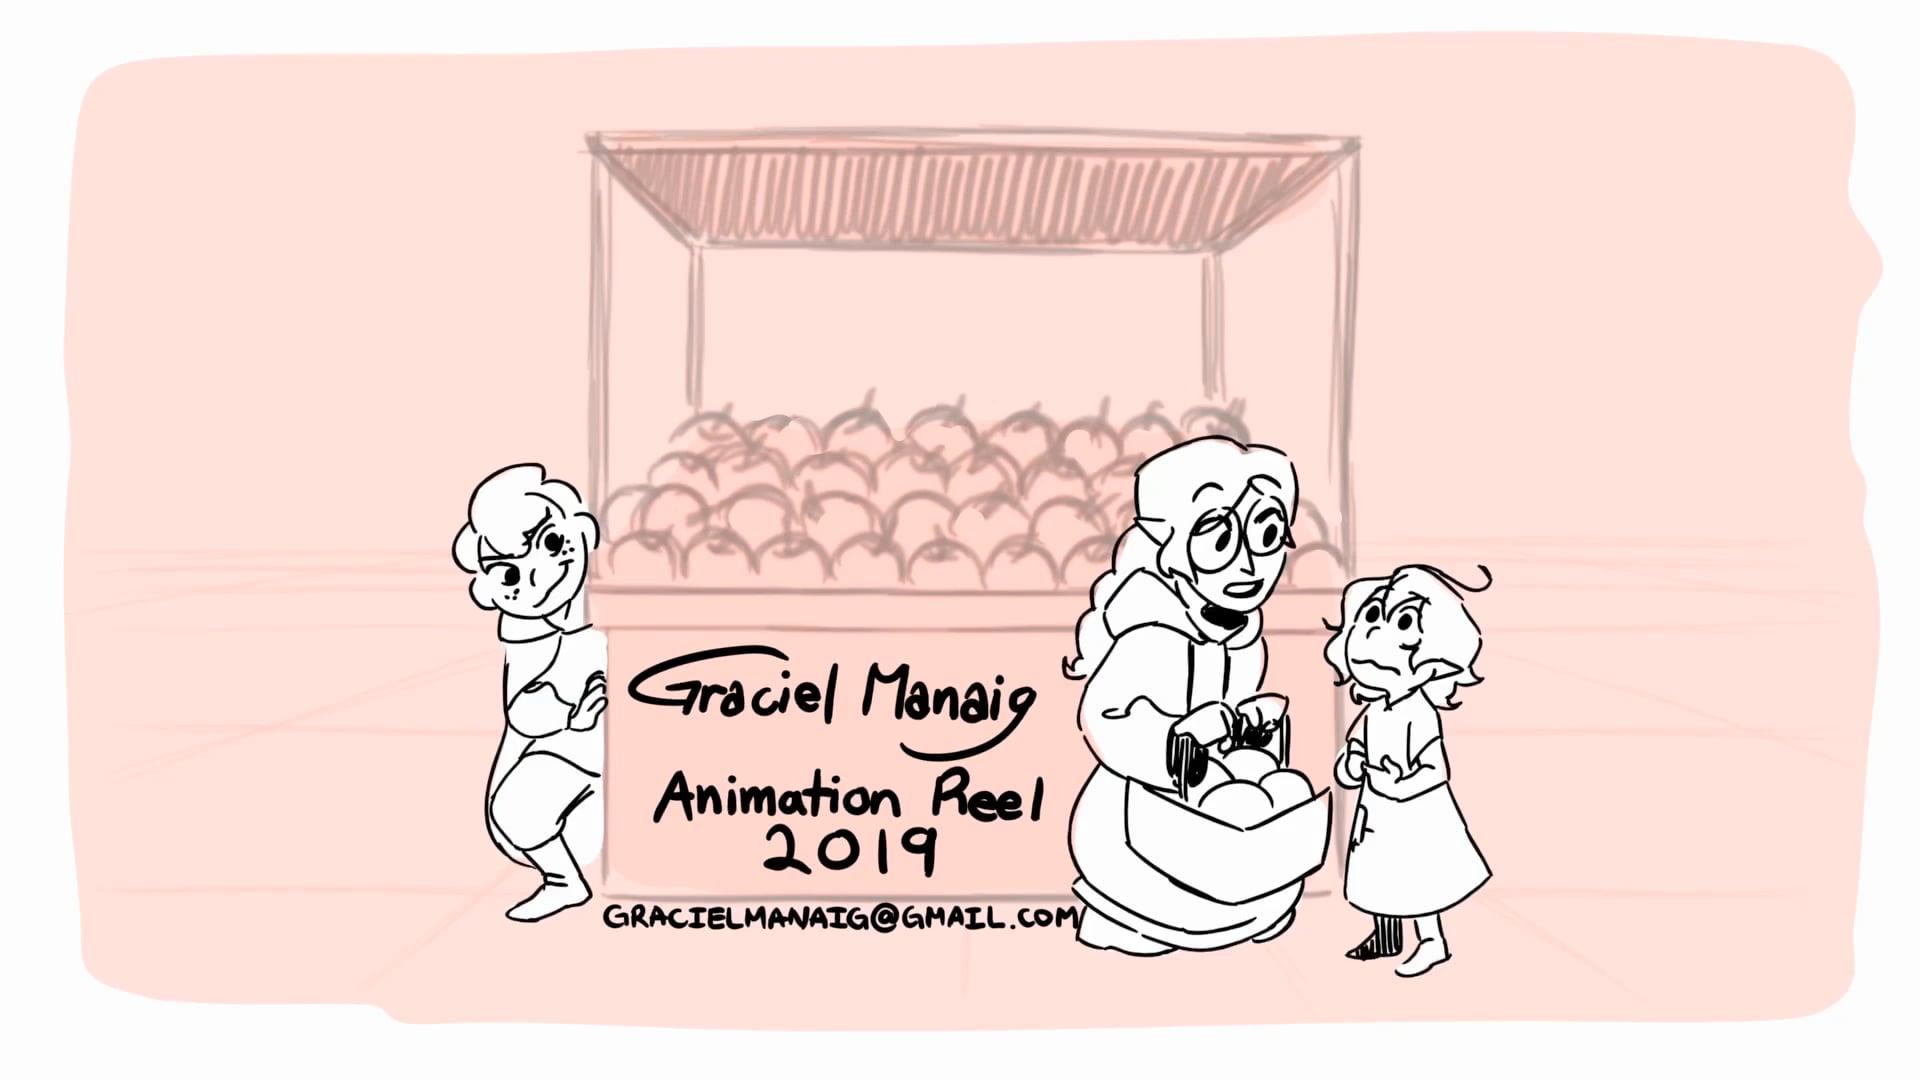 Graciel Manaig Animation Reel (2019)